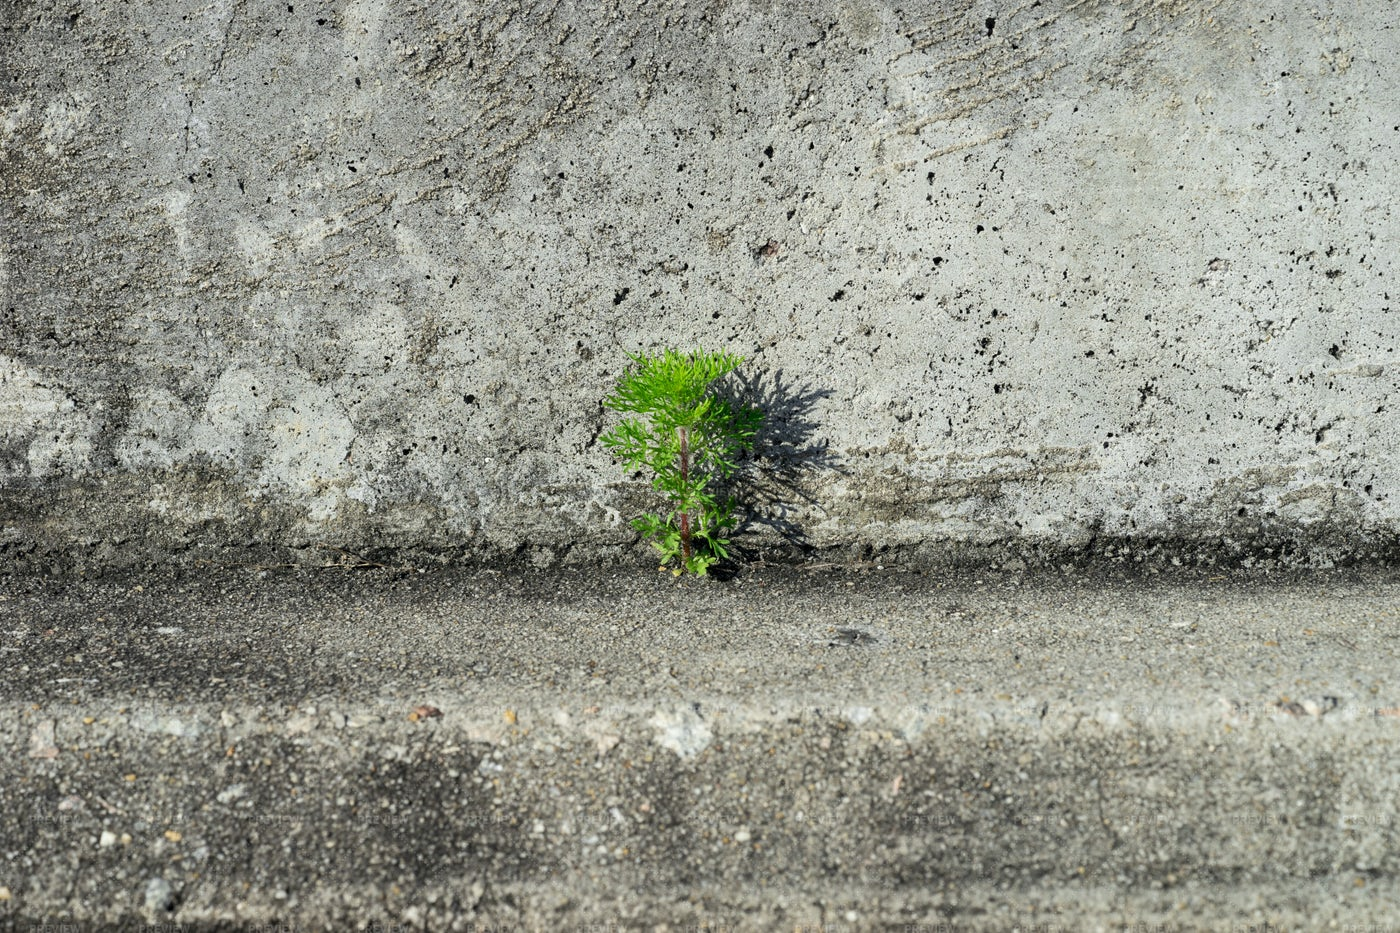 Plant On  Concrete: Stock Photos